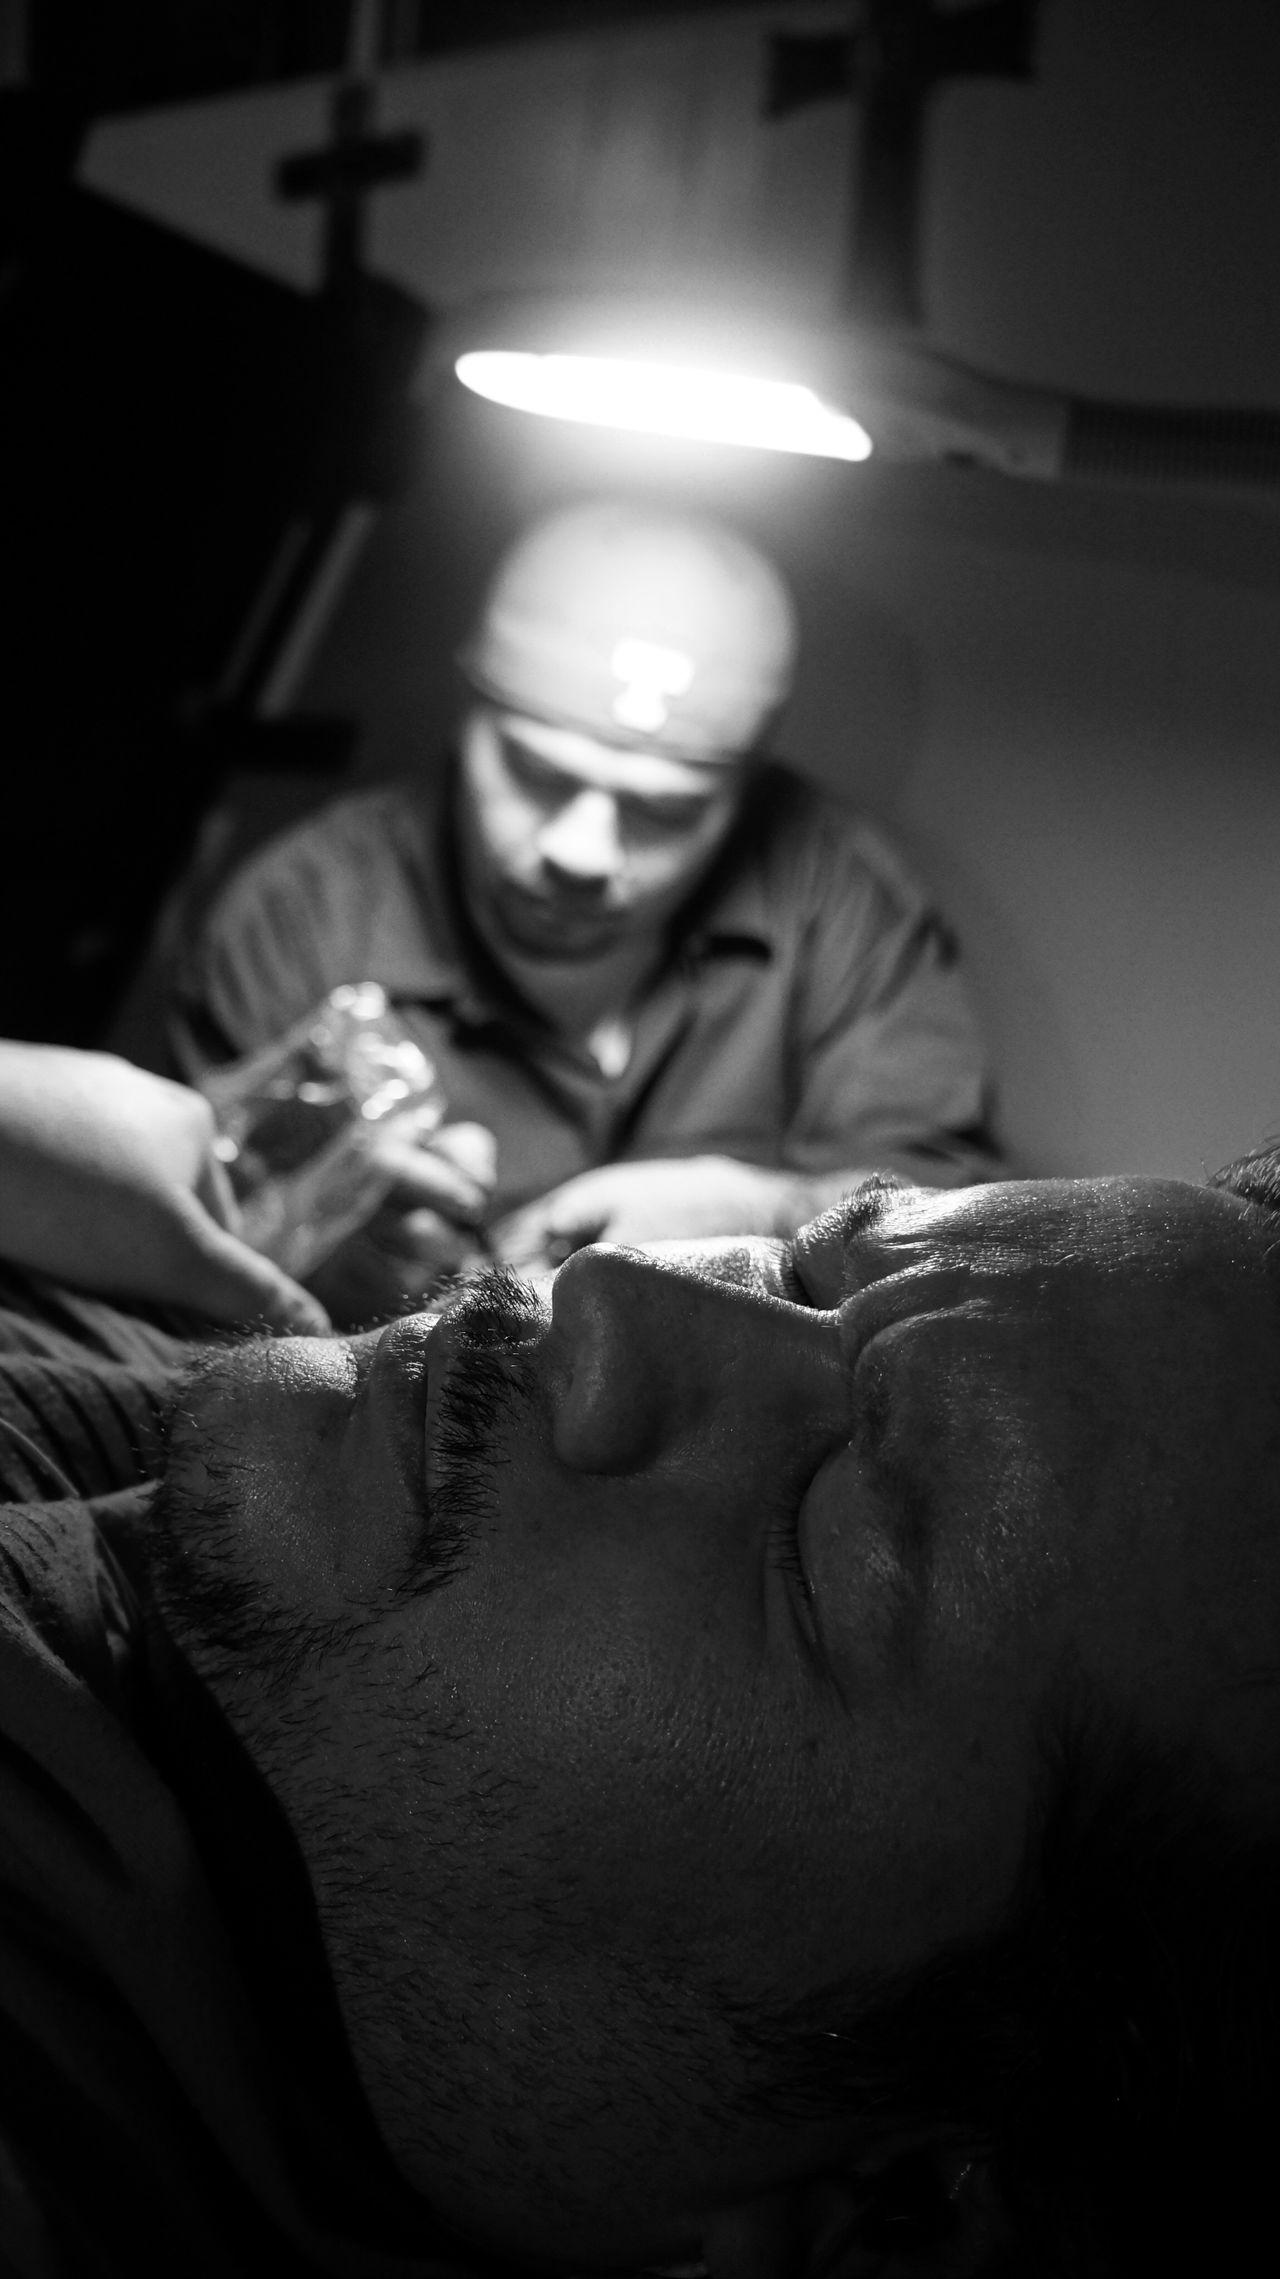 Face Of Pain Love Of Ink Addiction Sweat Tattoo Sleeve Turtle Magic